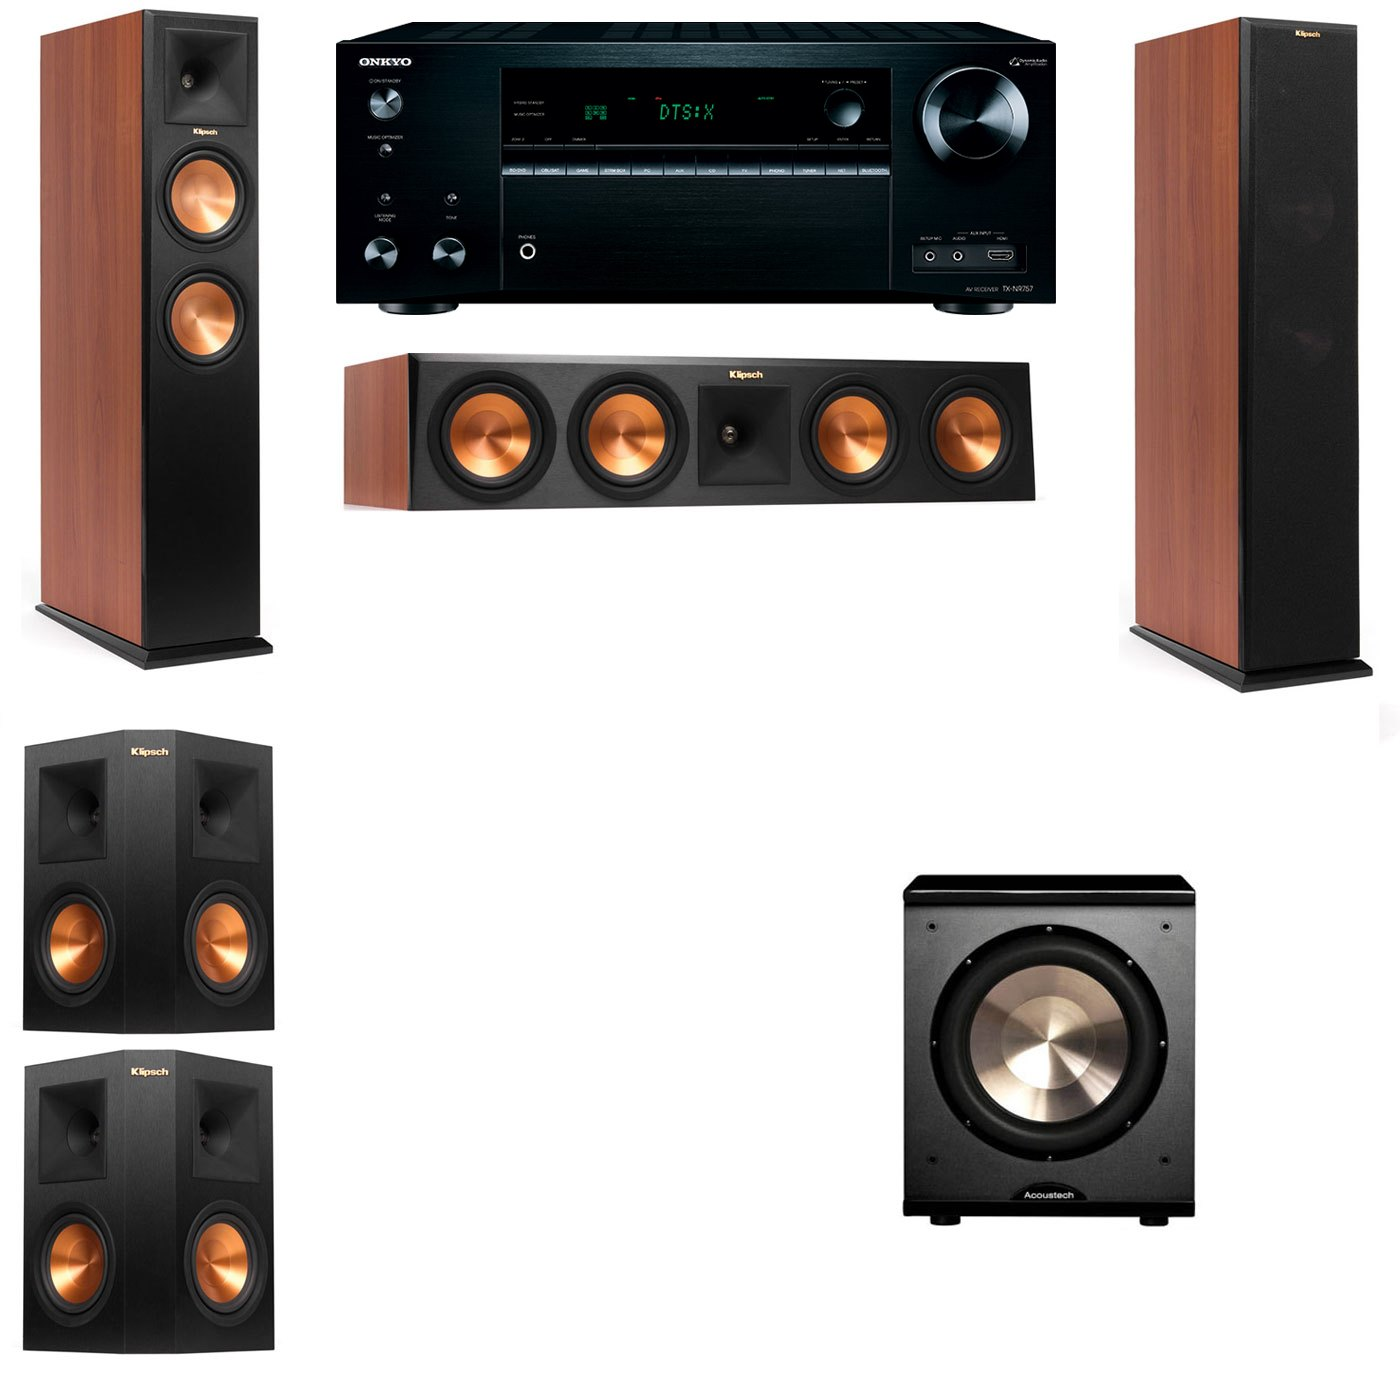 Klipsch RP-250F Tower Speakers CH-PL-200-5.1-Onkyo TX-NR757